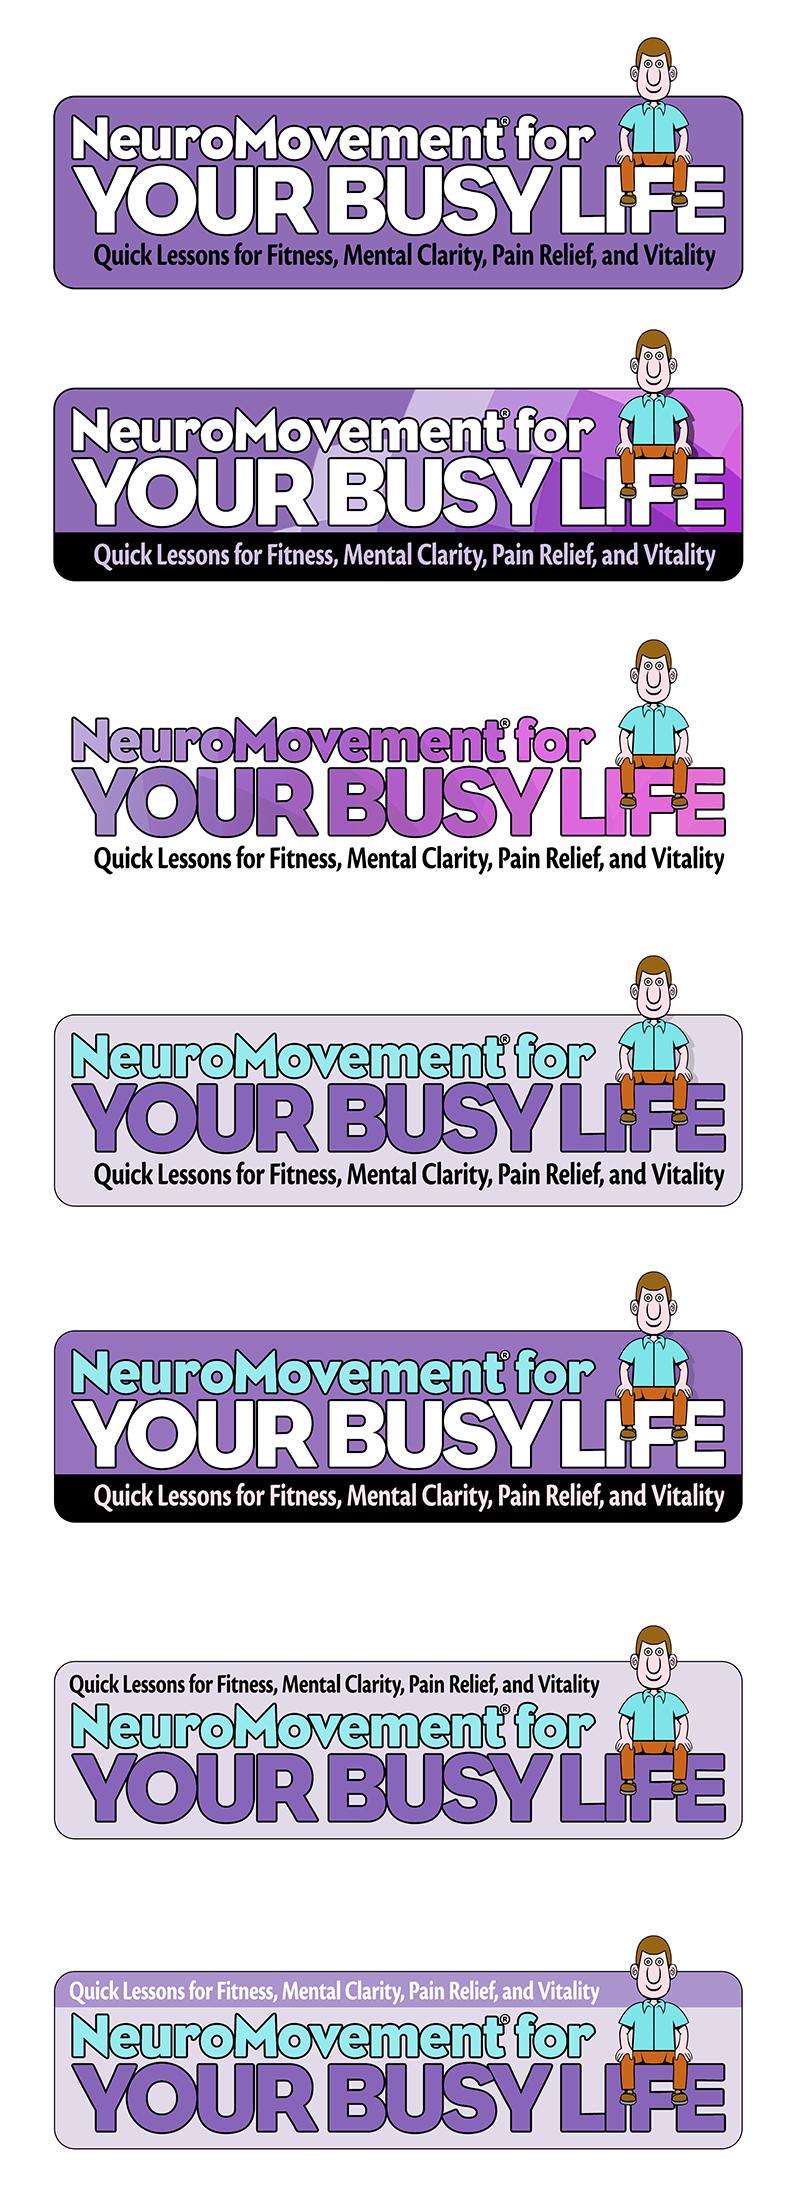 NeuroMovement Desktop Trainer Logo Ideas